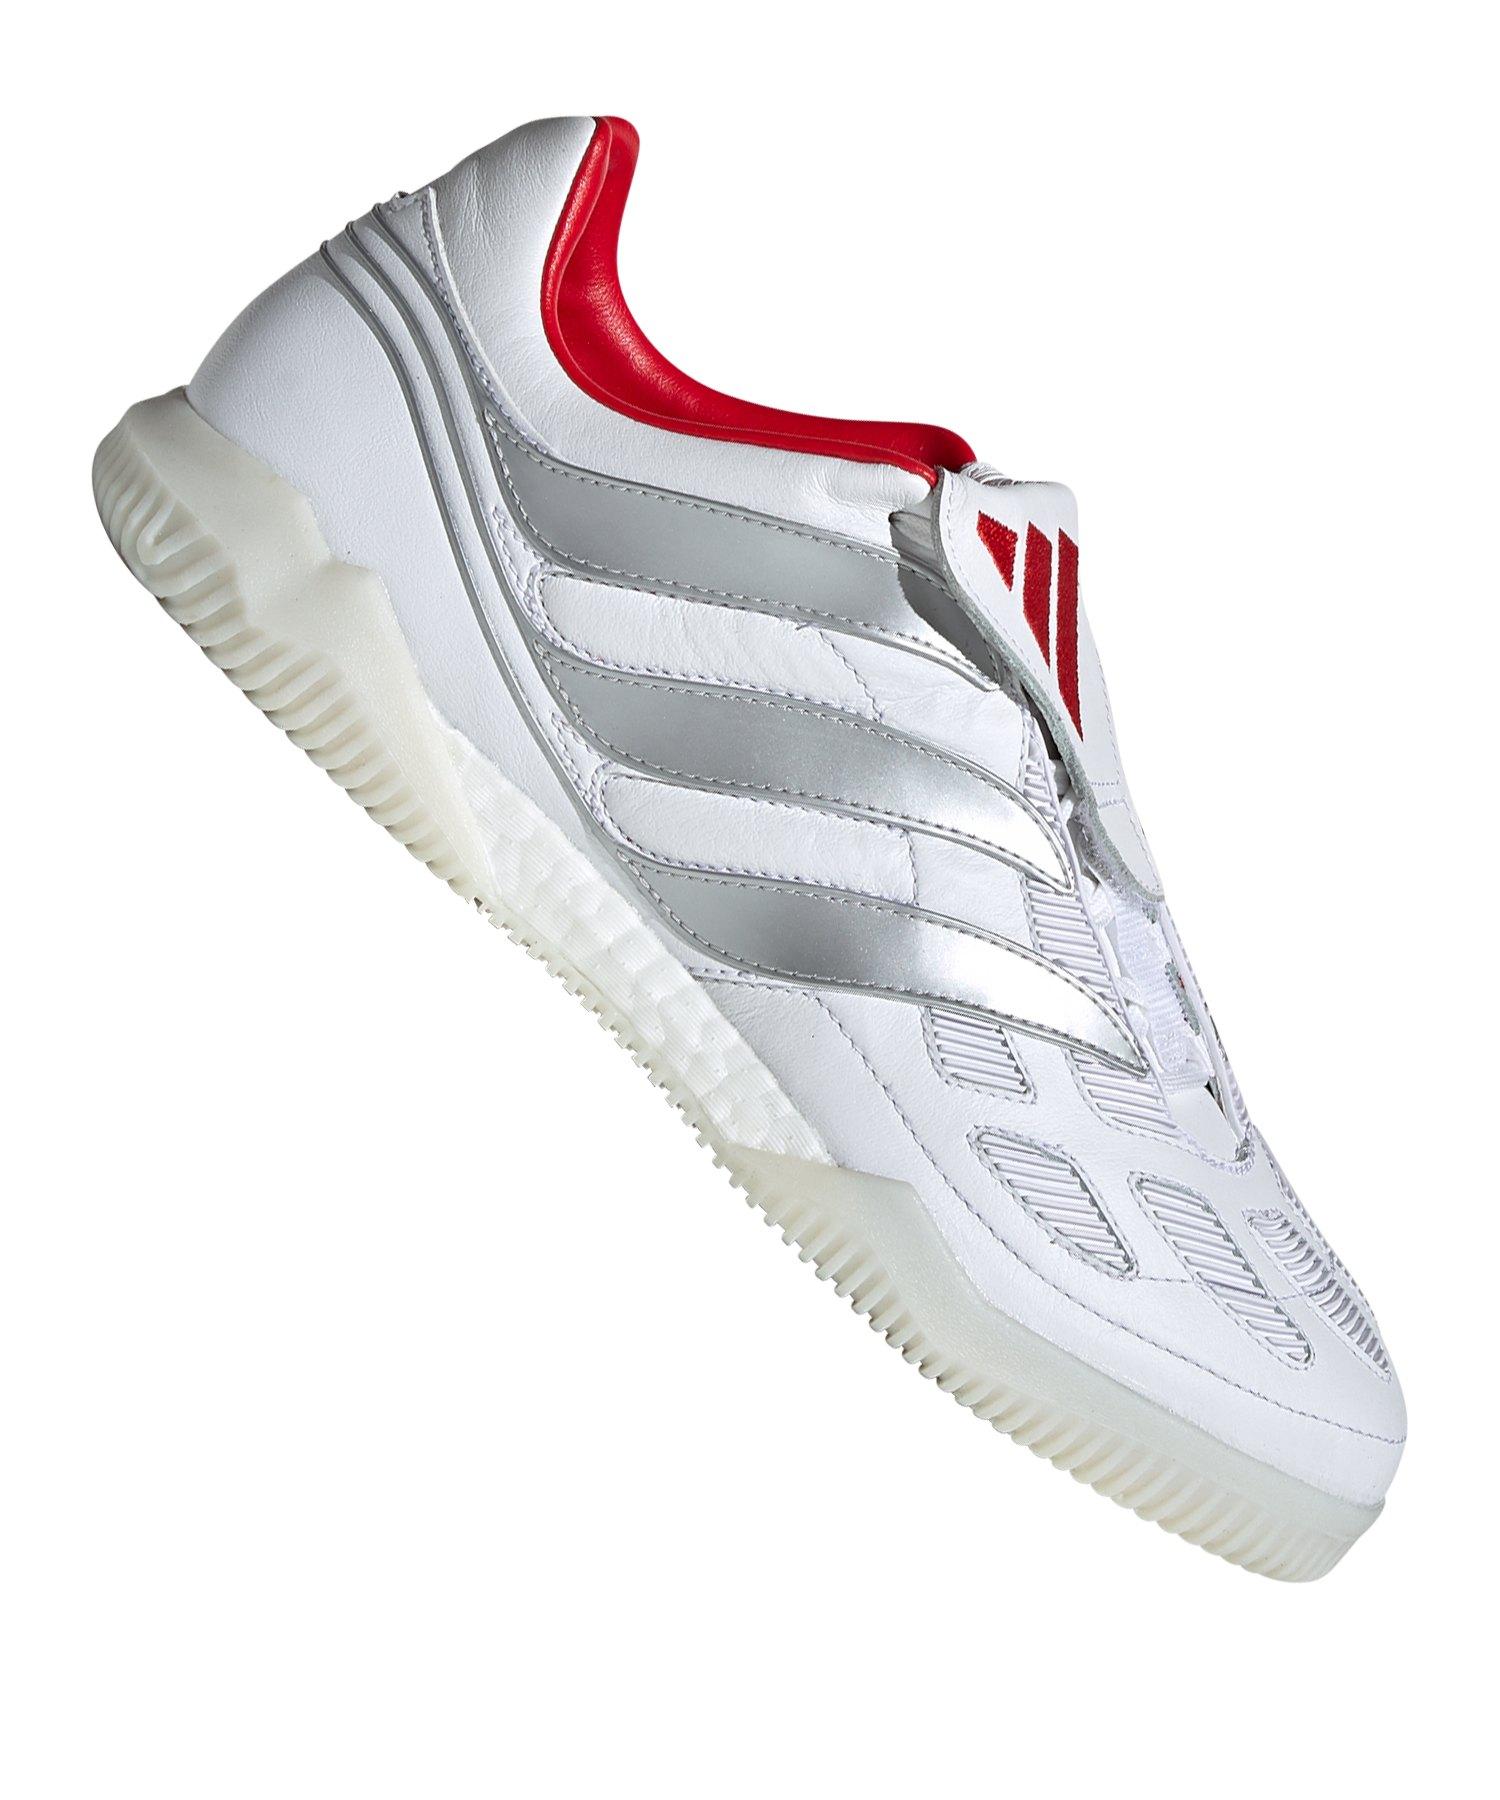 Adidas Predator Weiss Precision Beckham Tr 9DIEH2